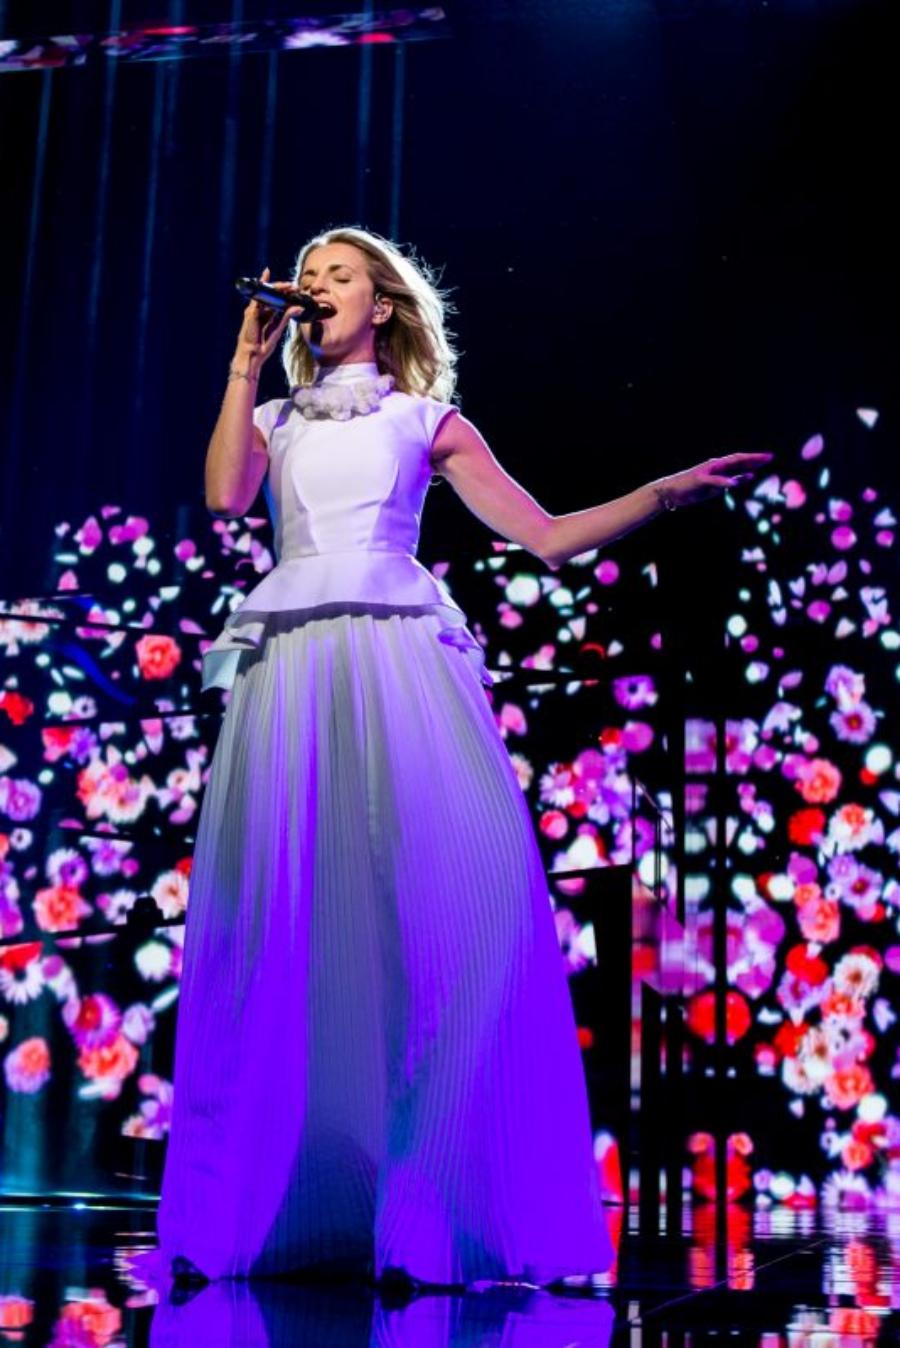 Eurovision Song Contest 2016: Czech Republic